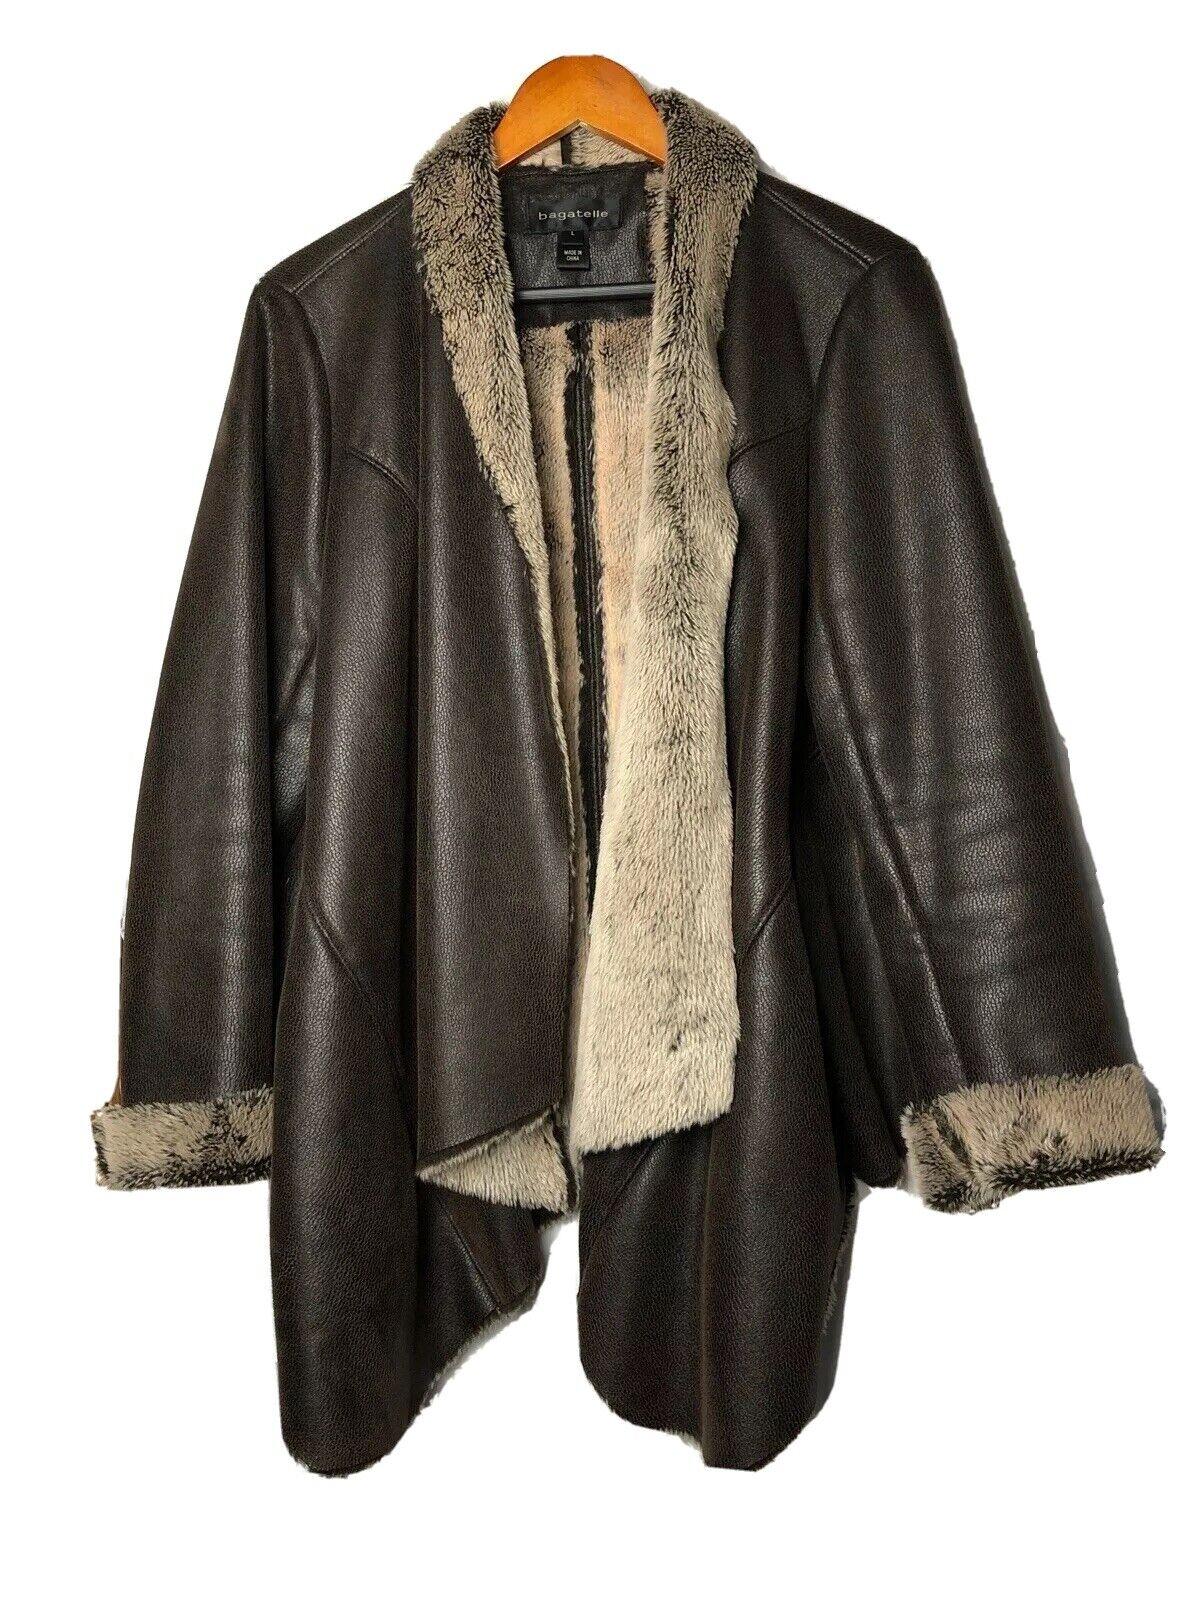 Bagatelle Brown Leather Jacket Faux Fur Lined Drape Large